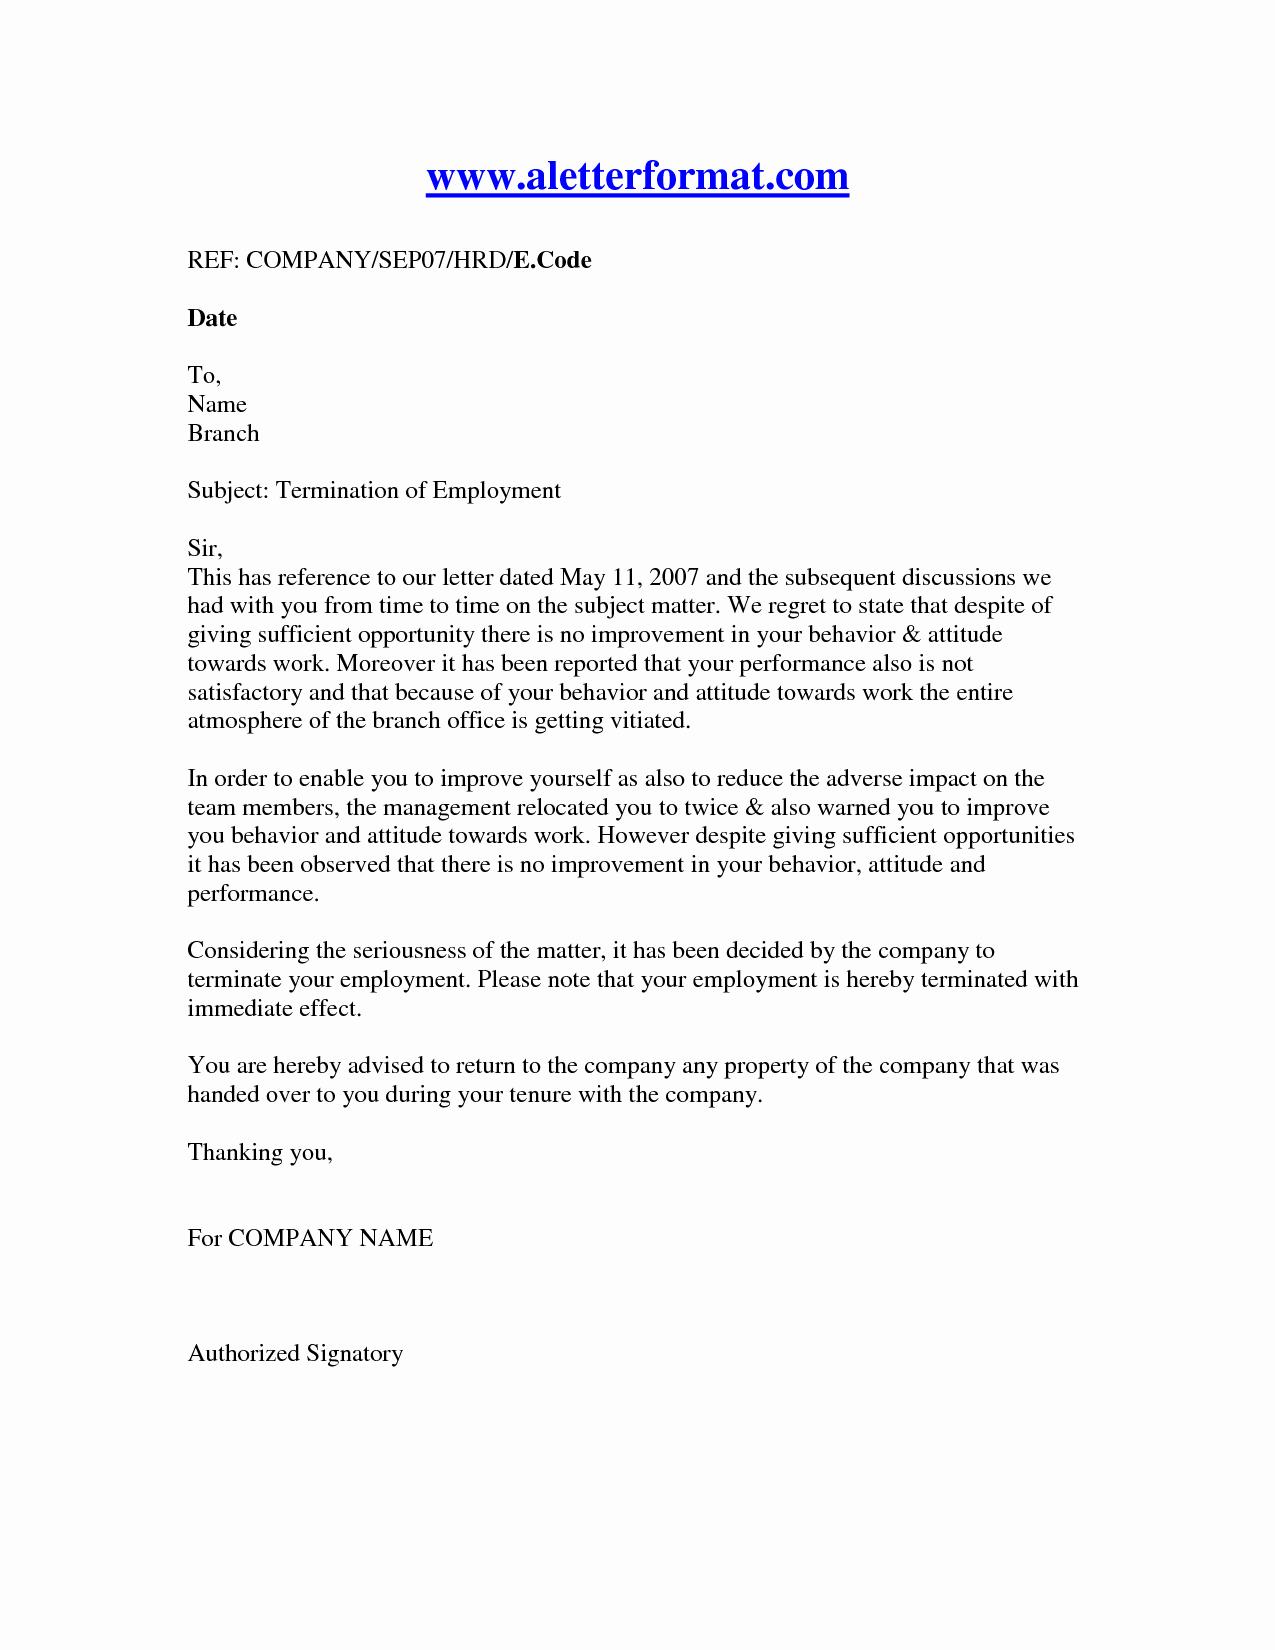 Letter Termination Employment